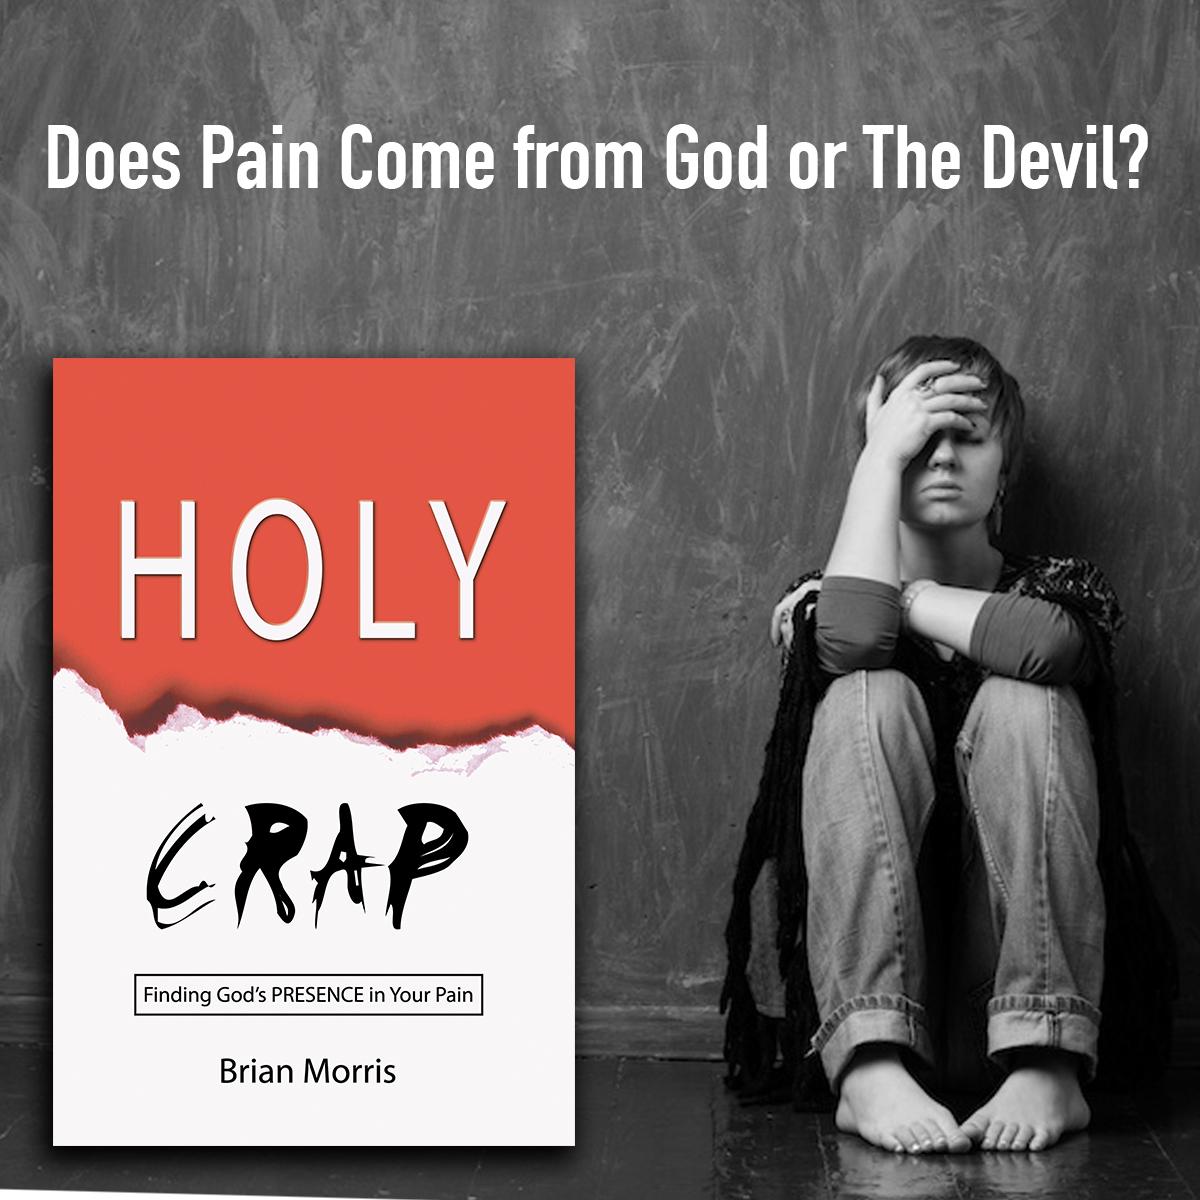 pain-and-god-image-header